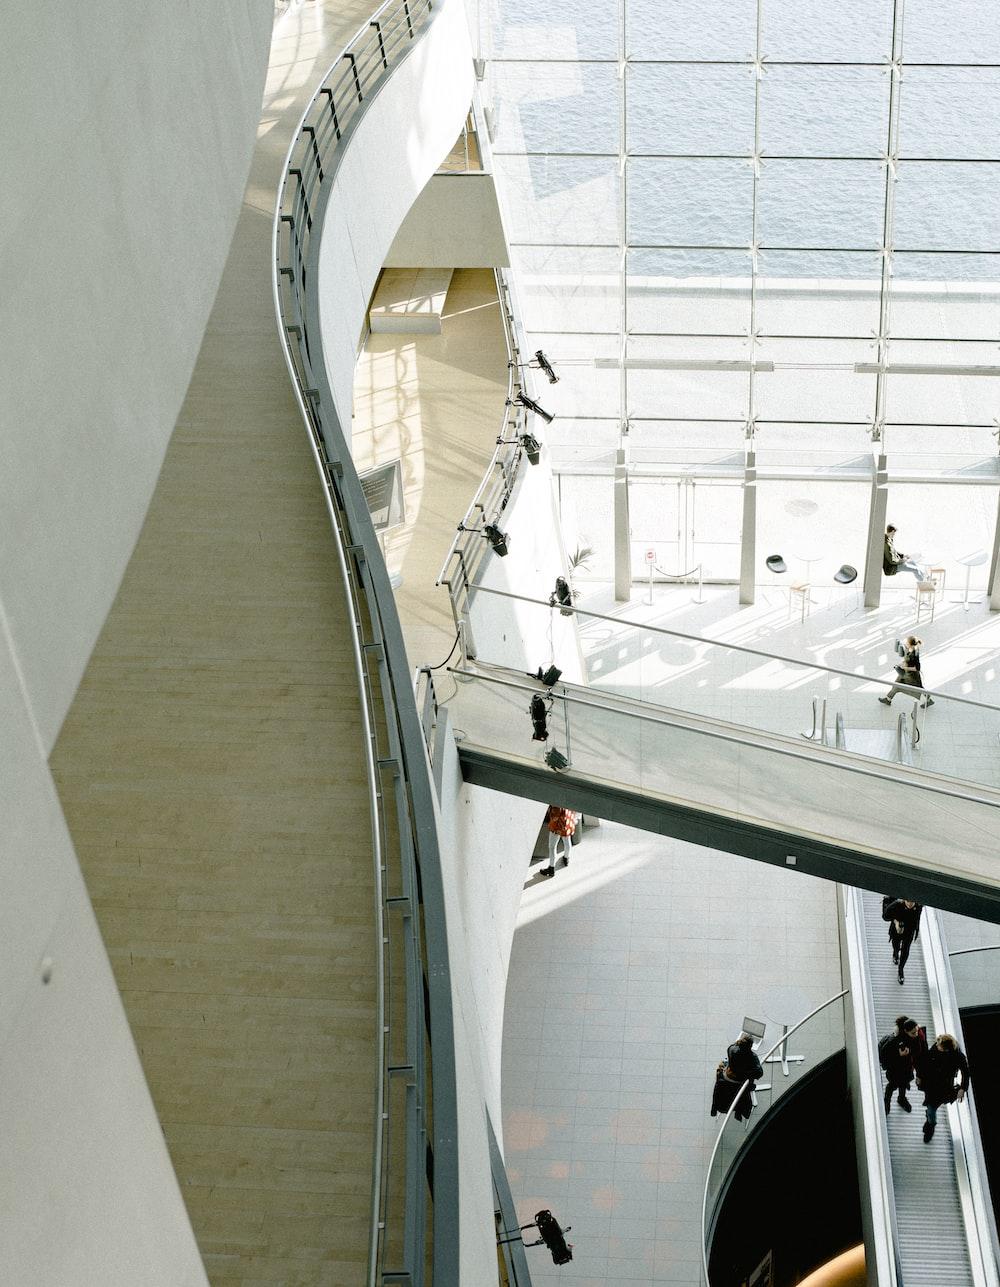 people walking inside white painted building